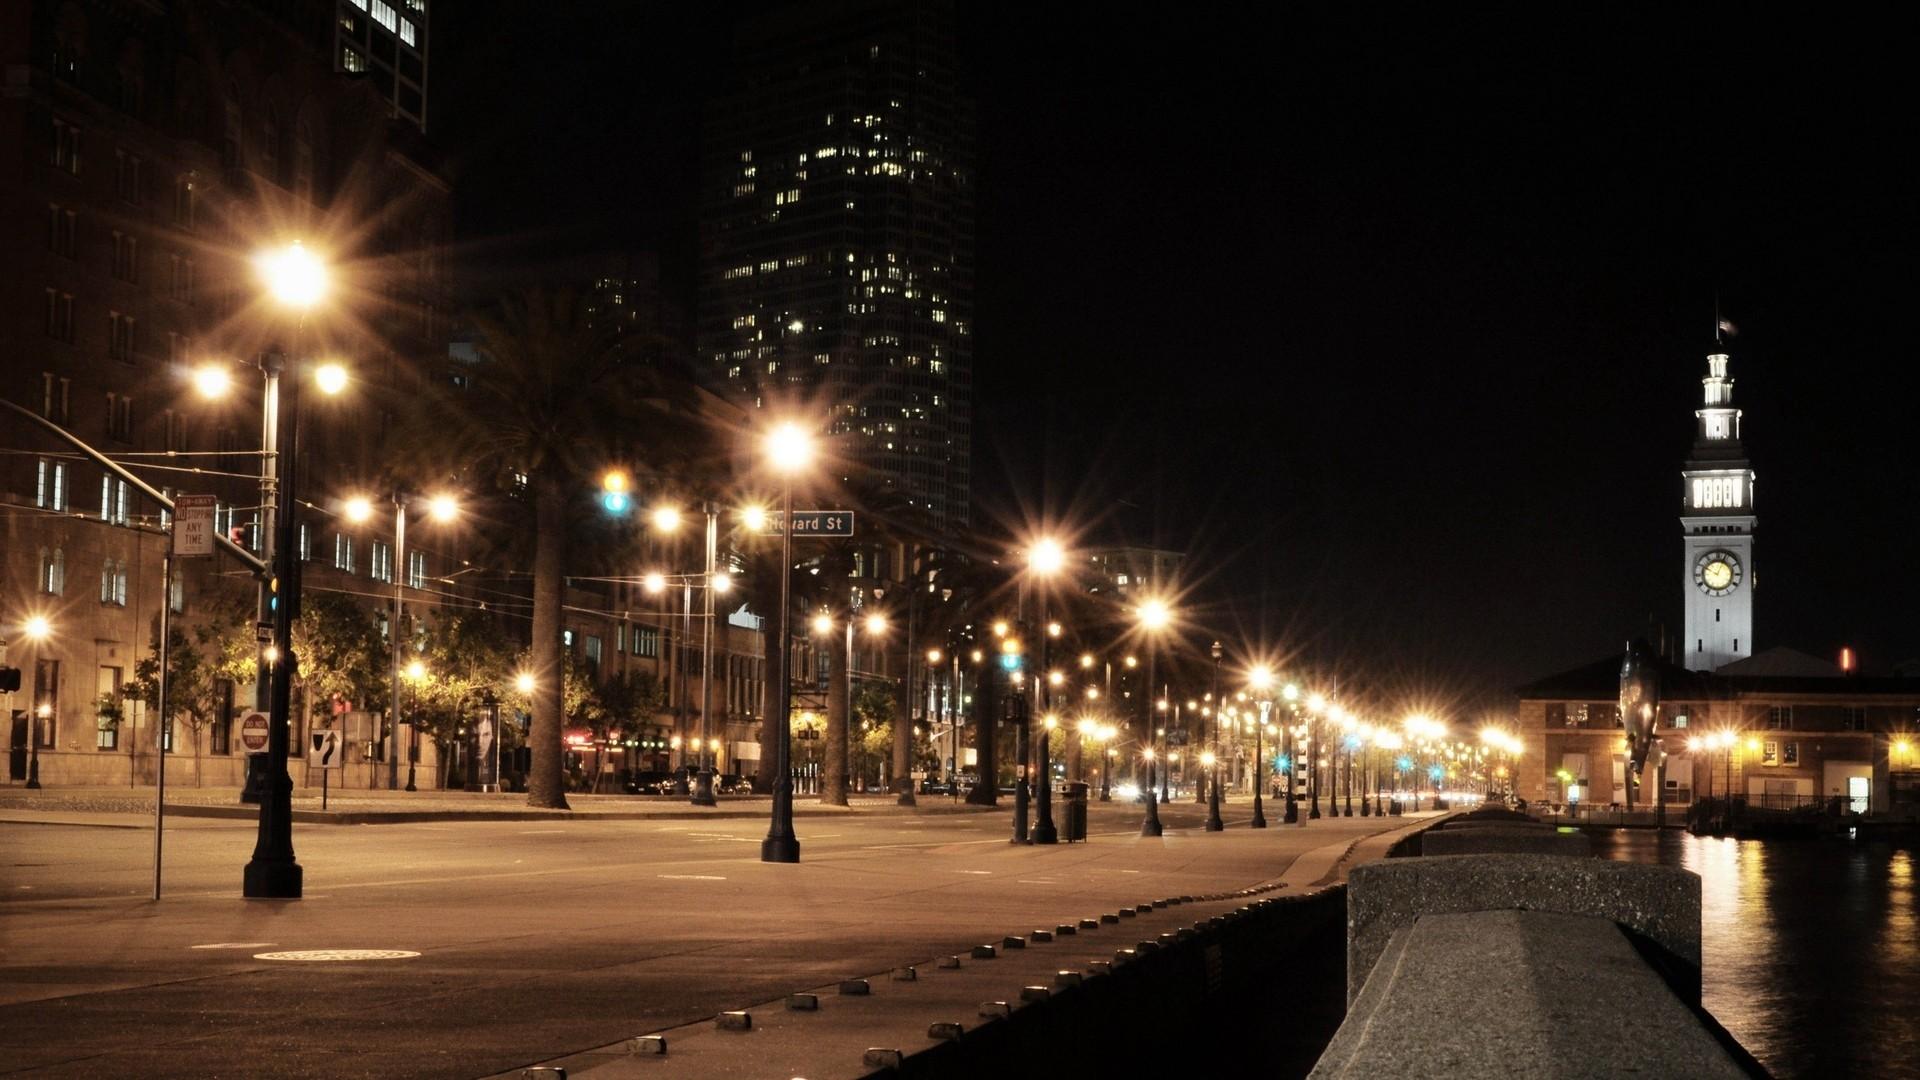 Wallpaper Usa, City, America, Night, Lights city, Road